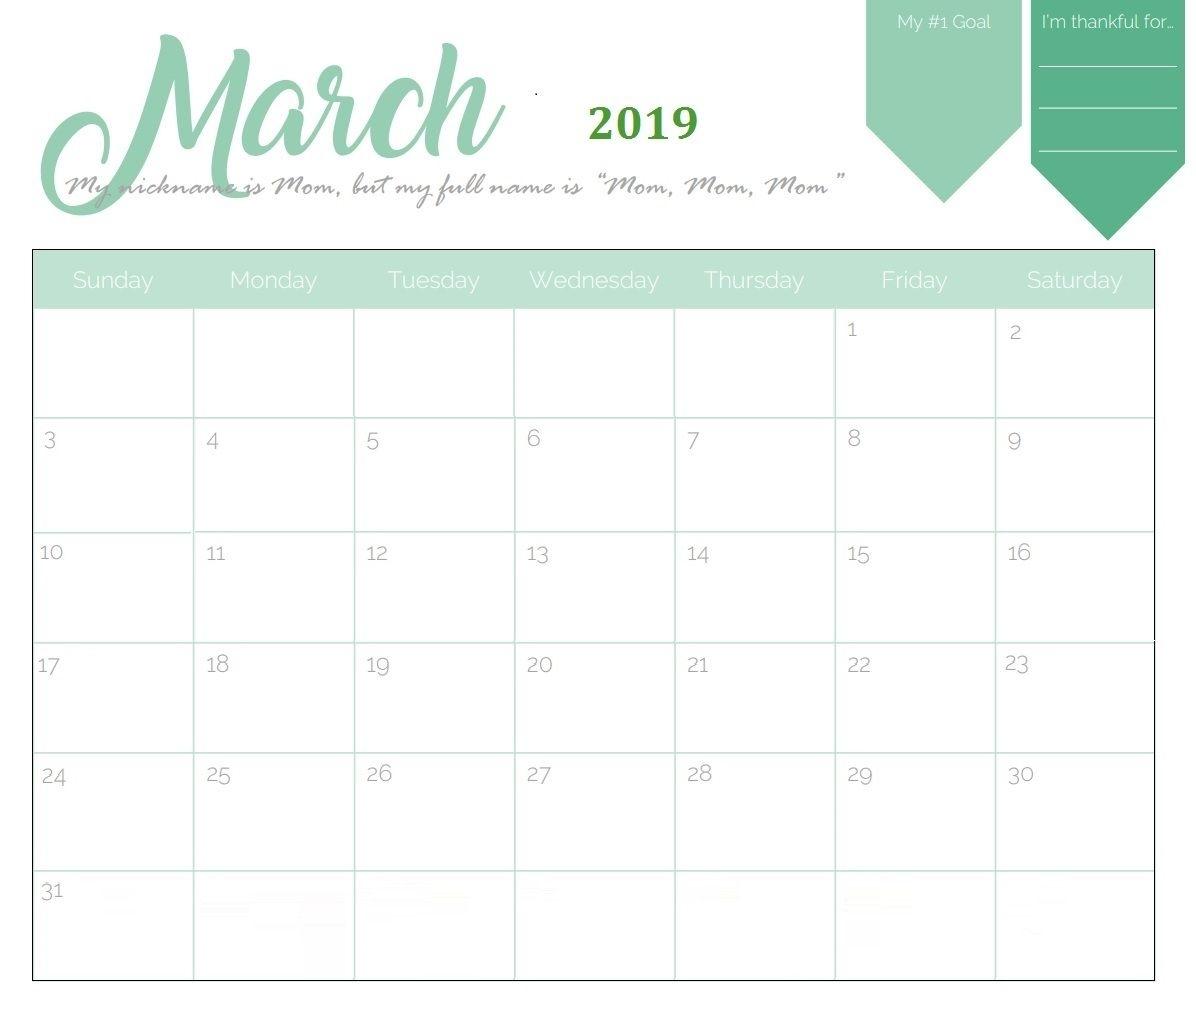 Printable Calendar 2019 Imom | Printable Calendar 2019 regarding 2020 Imom Calendar Printable